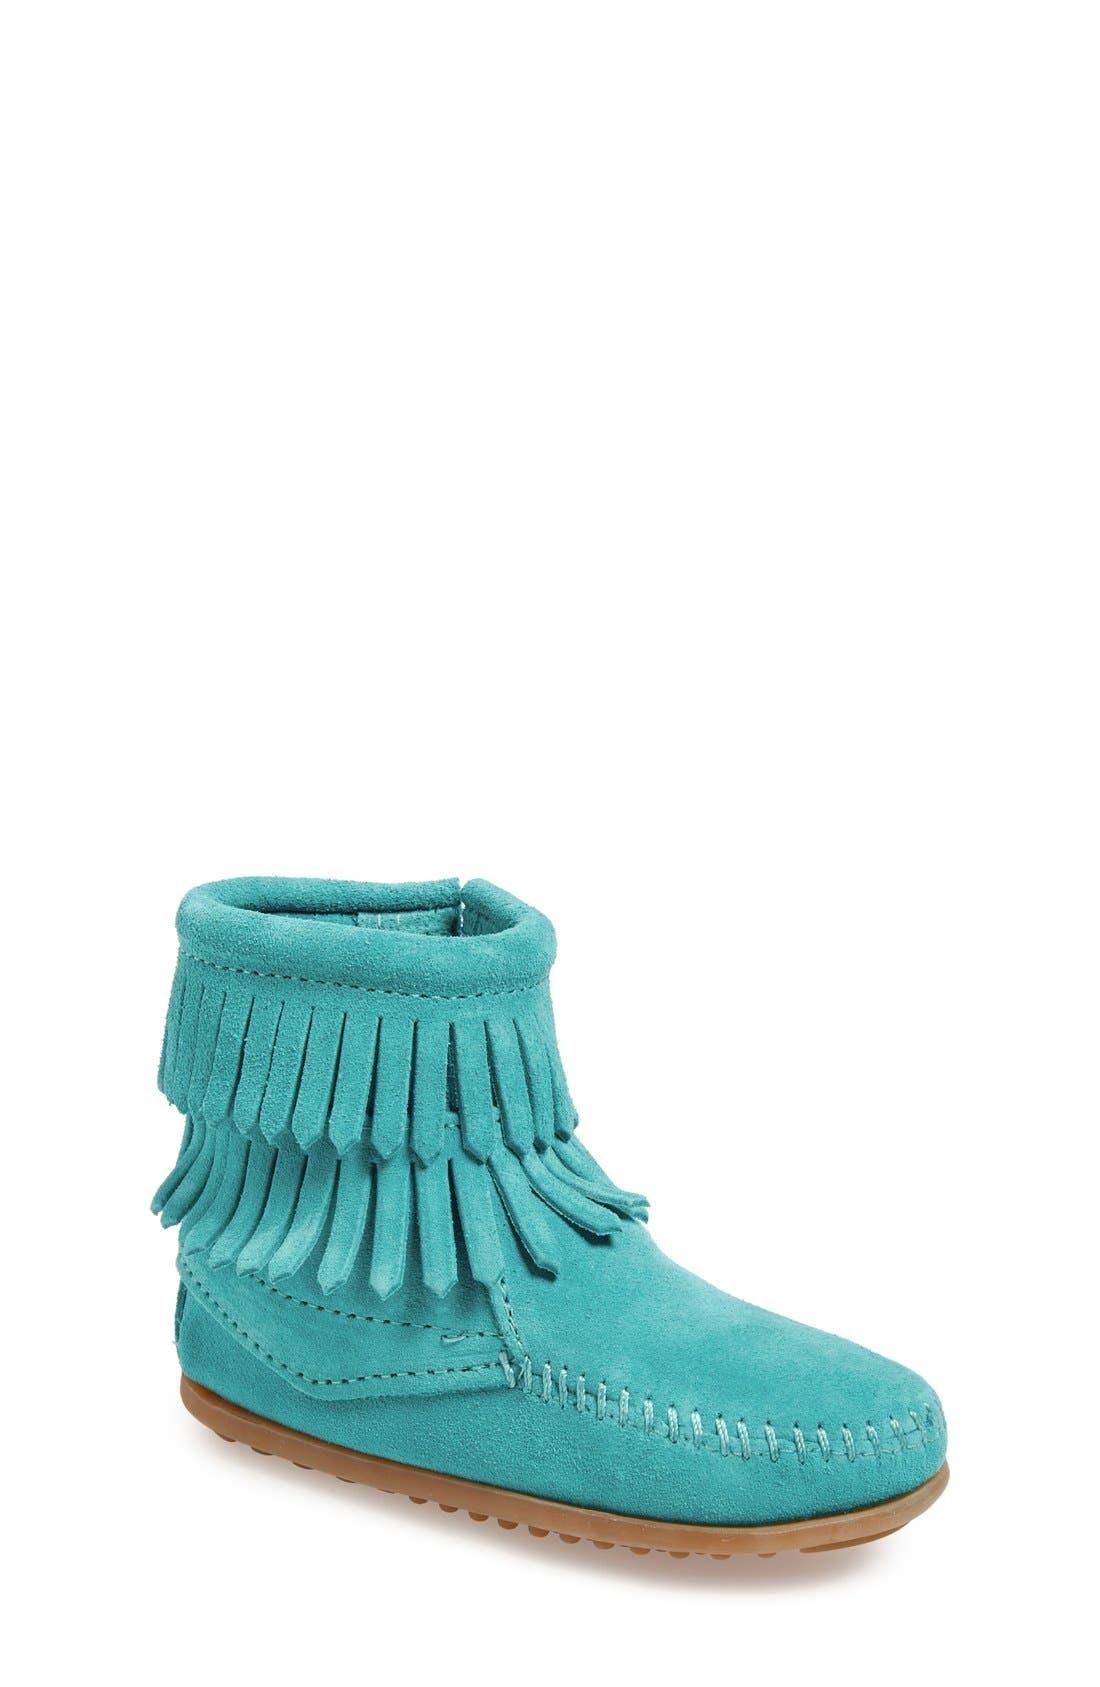 MINNETONKA 'Double Fringe' Boot, Main, color, TURQUOISE